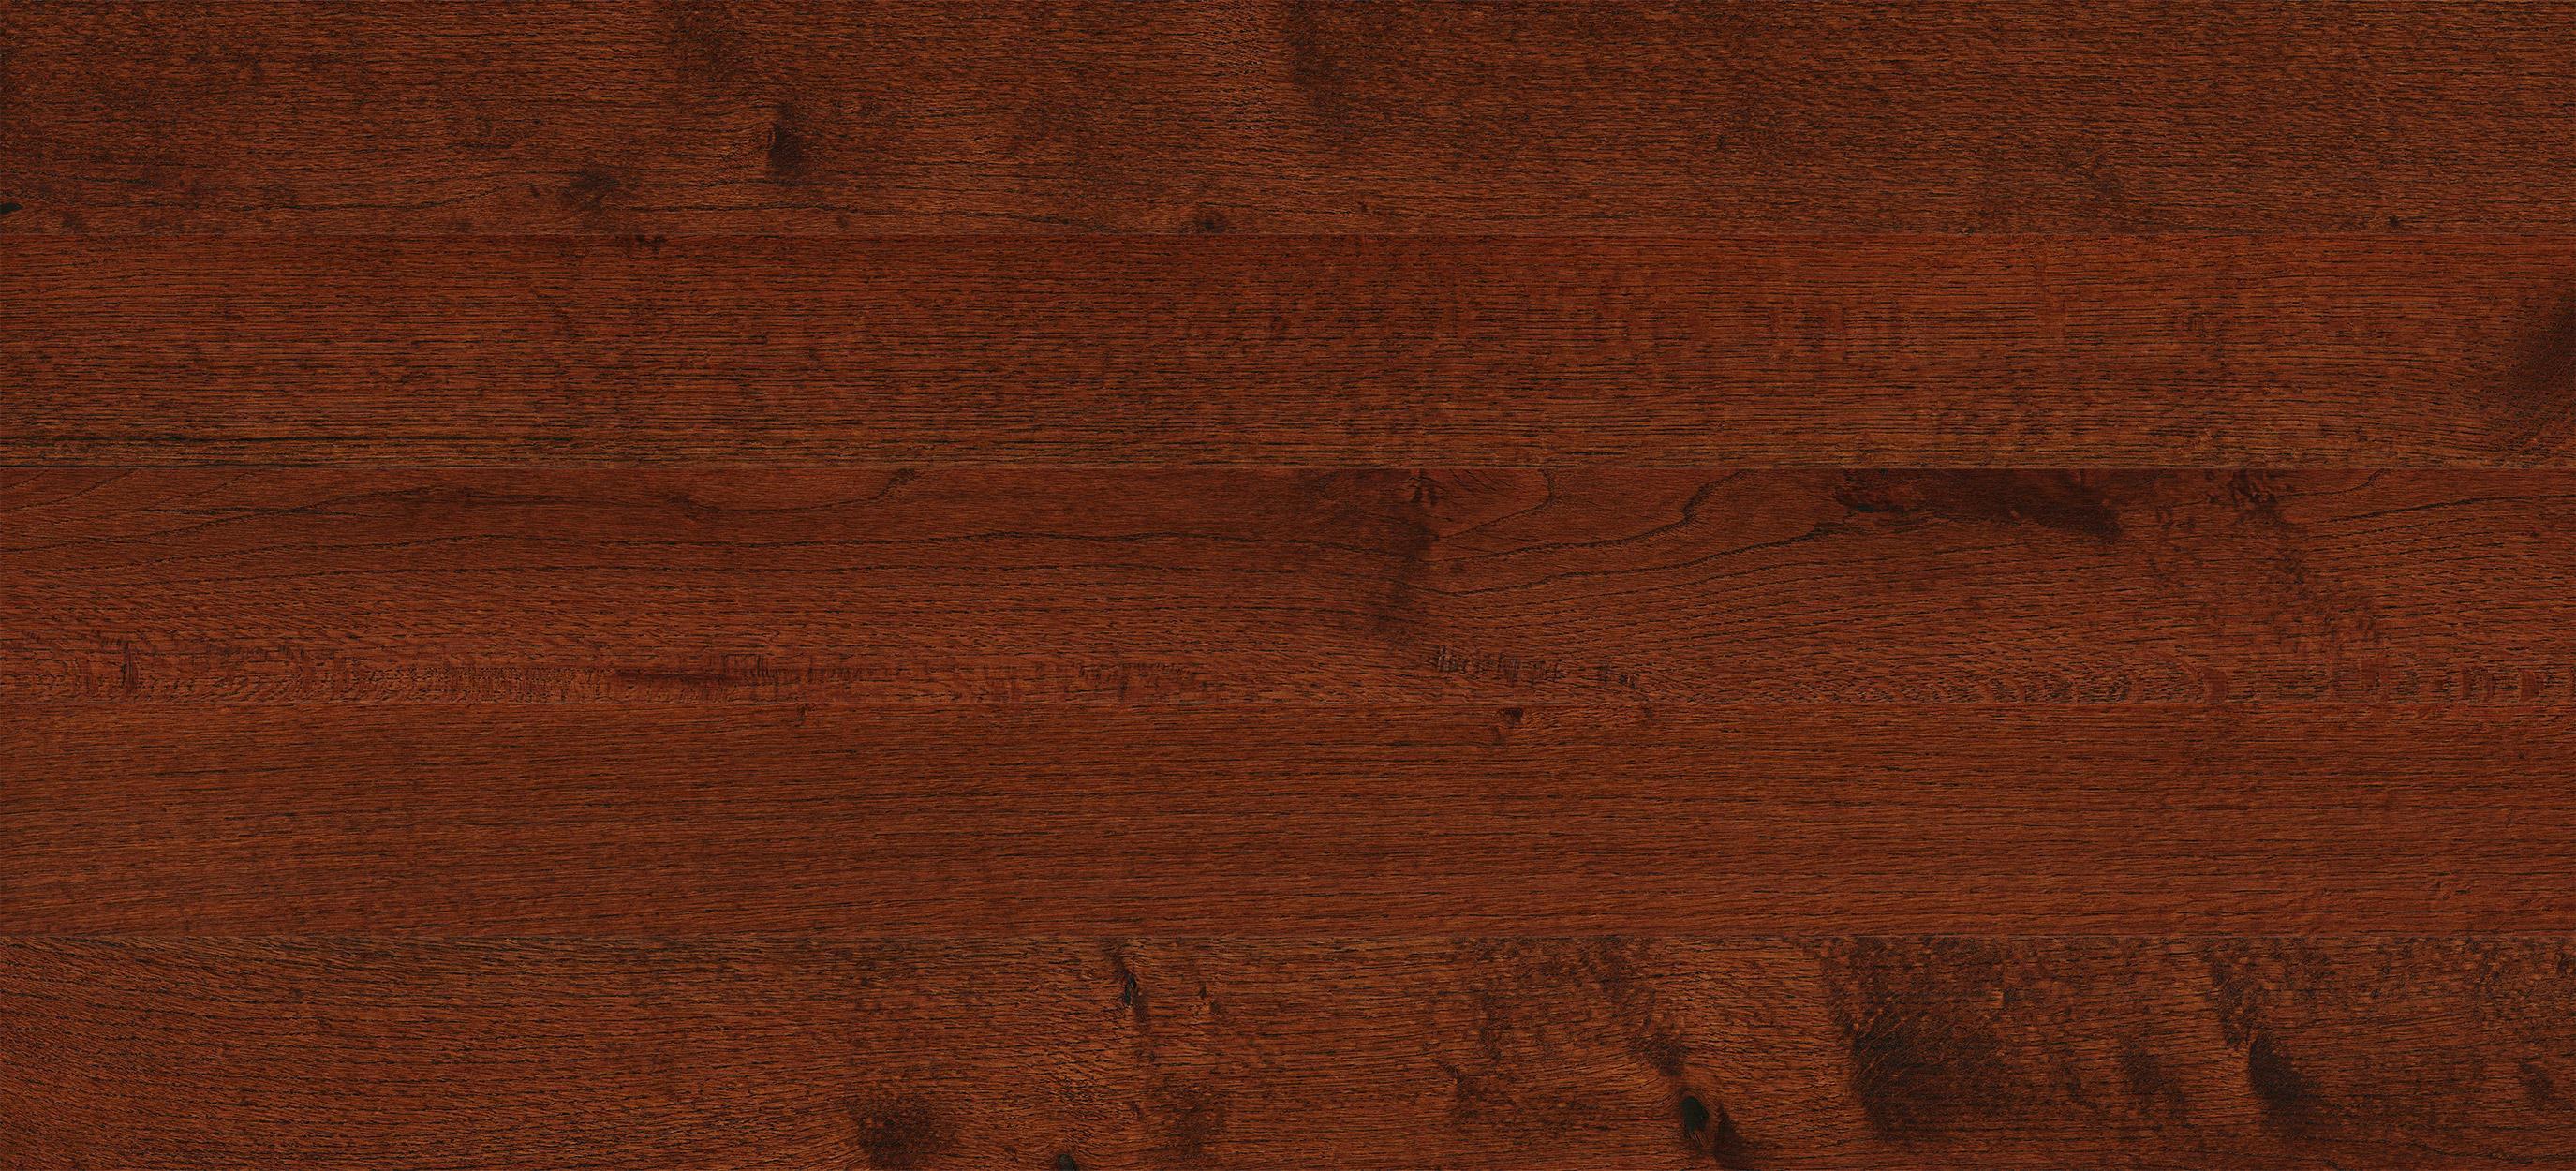 5 8 inch engineered hardwood flooring of timber hardwood red oak sorrell 5 wide solid hardwood flooring intended for red oak sorrell timber solid 5 x 55 ish horizontal